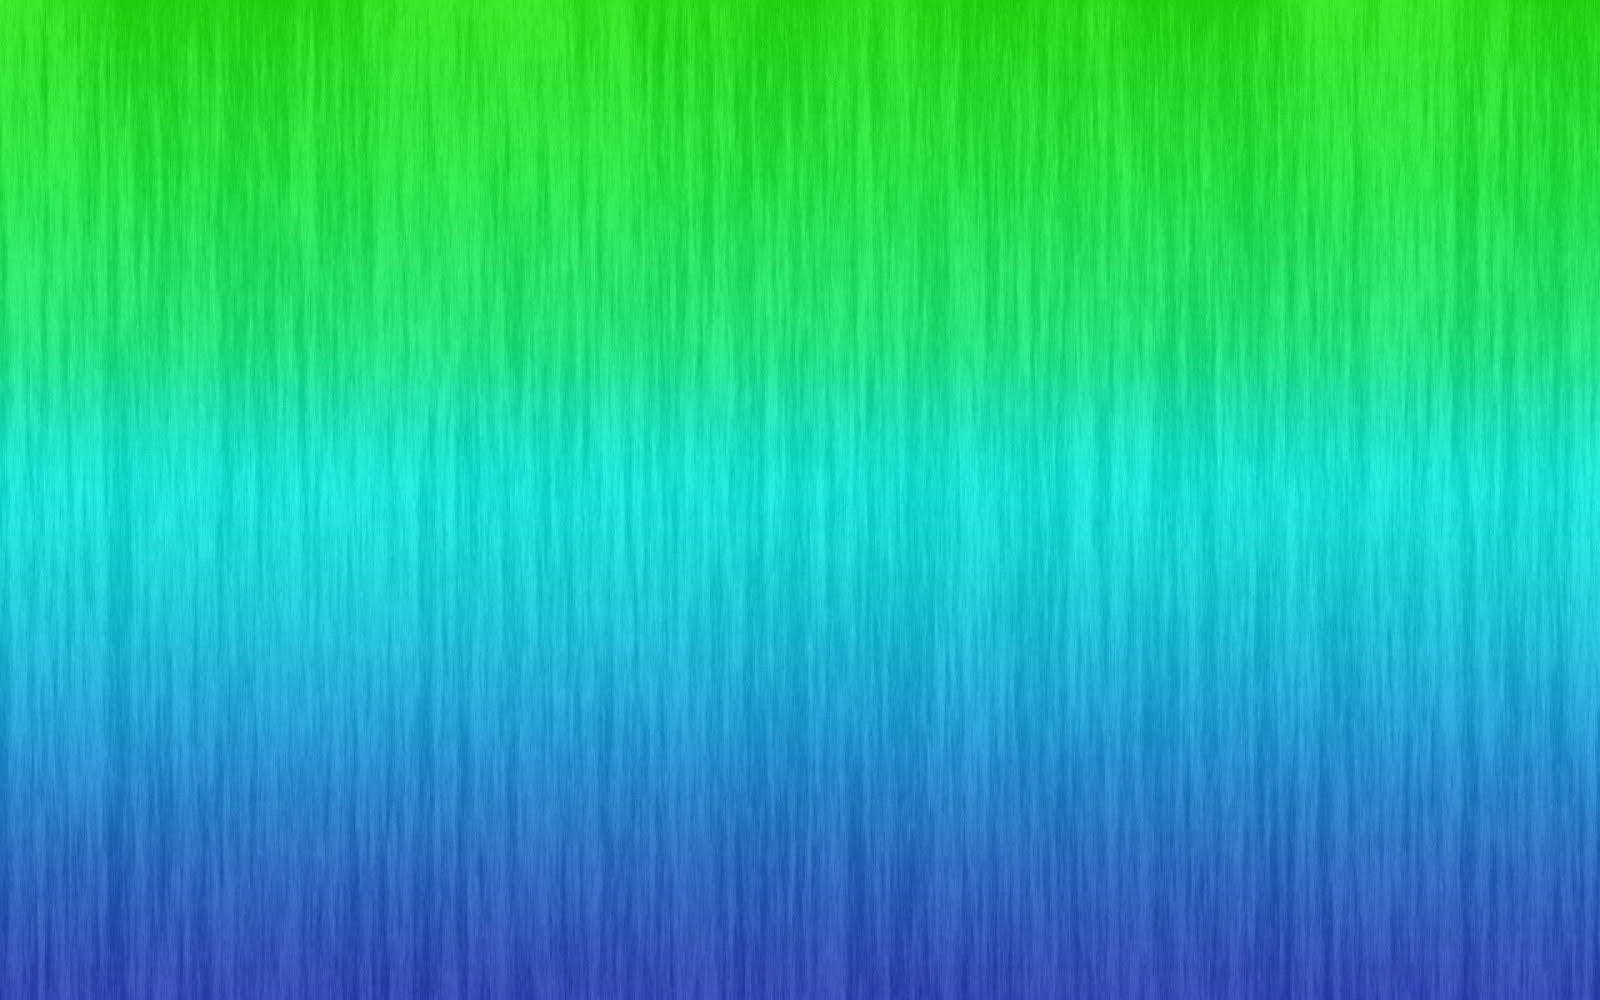 resultado de imagem para green and blue wallpaper wallpapers